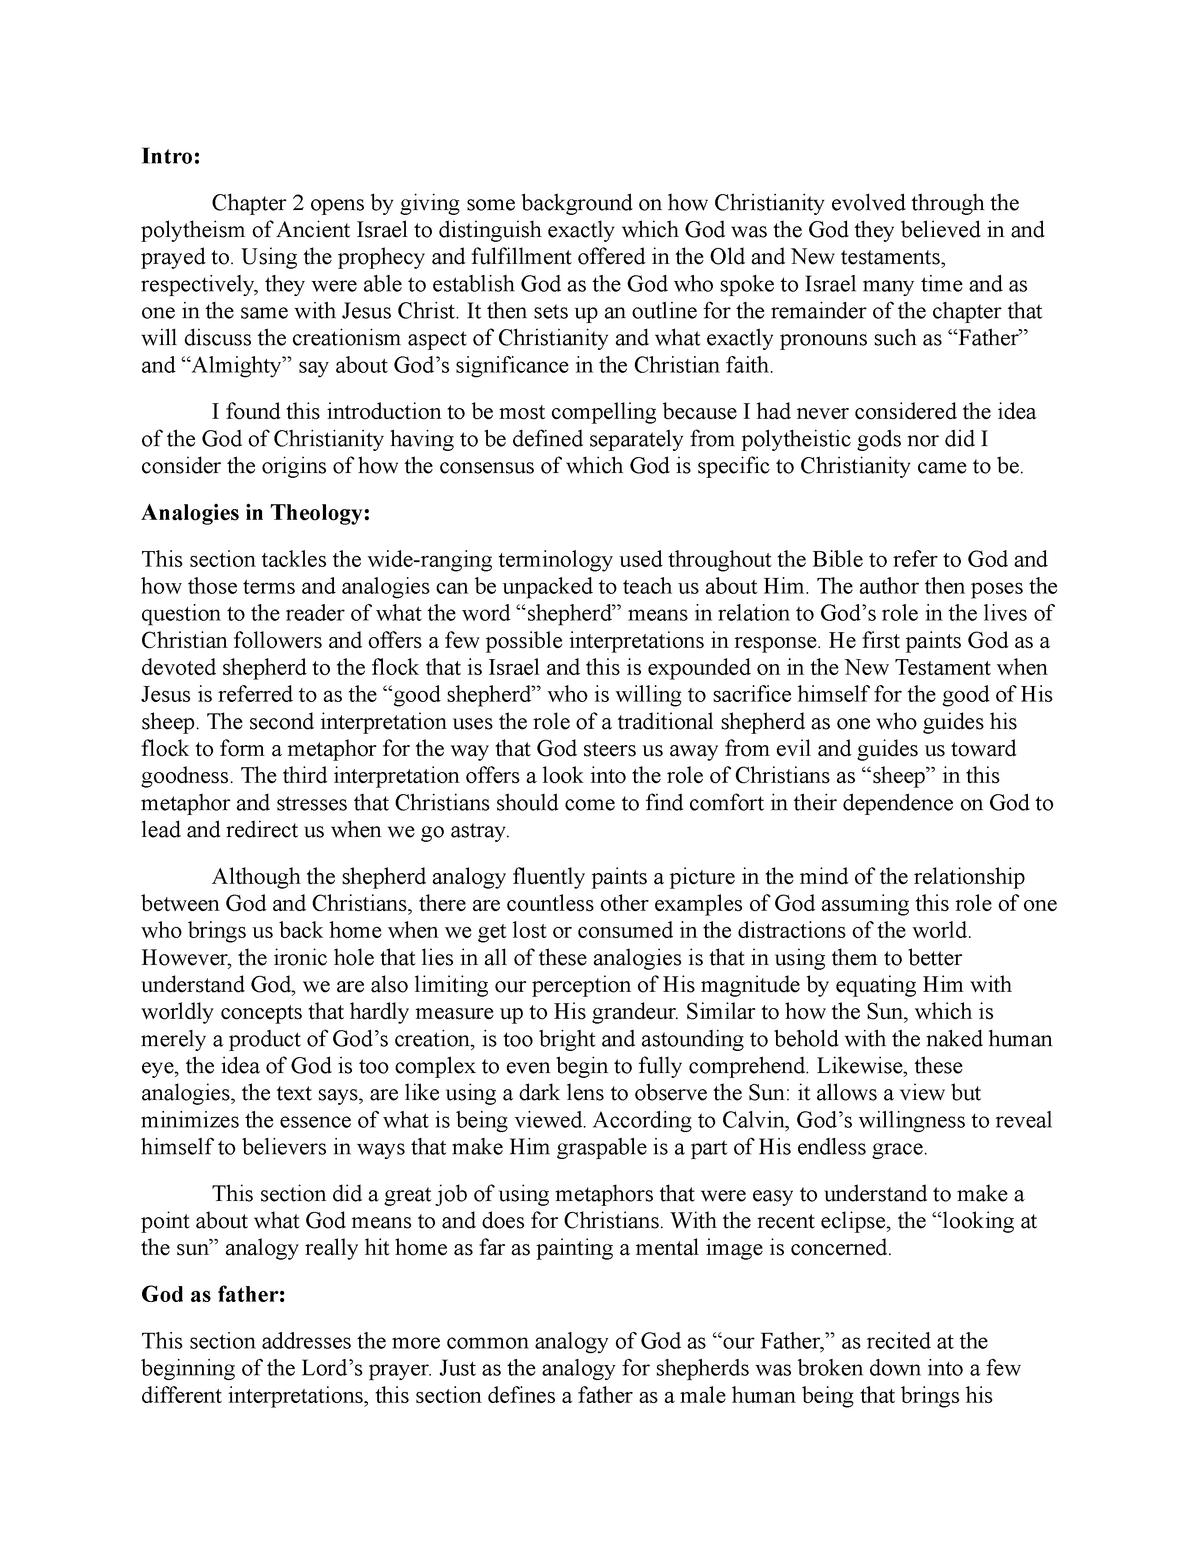 Summary Theology: the basics 29 Mar 2018 - StuDocu